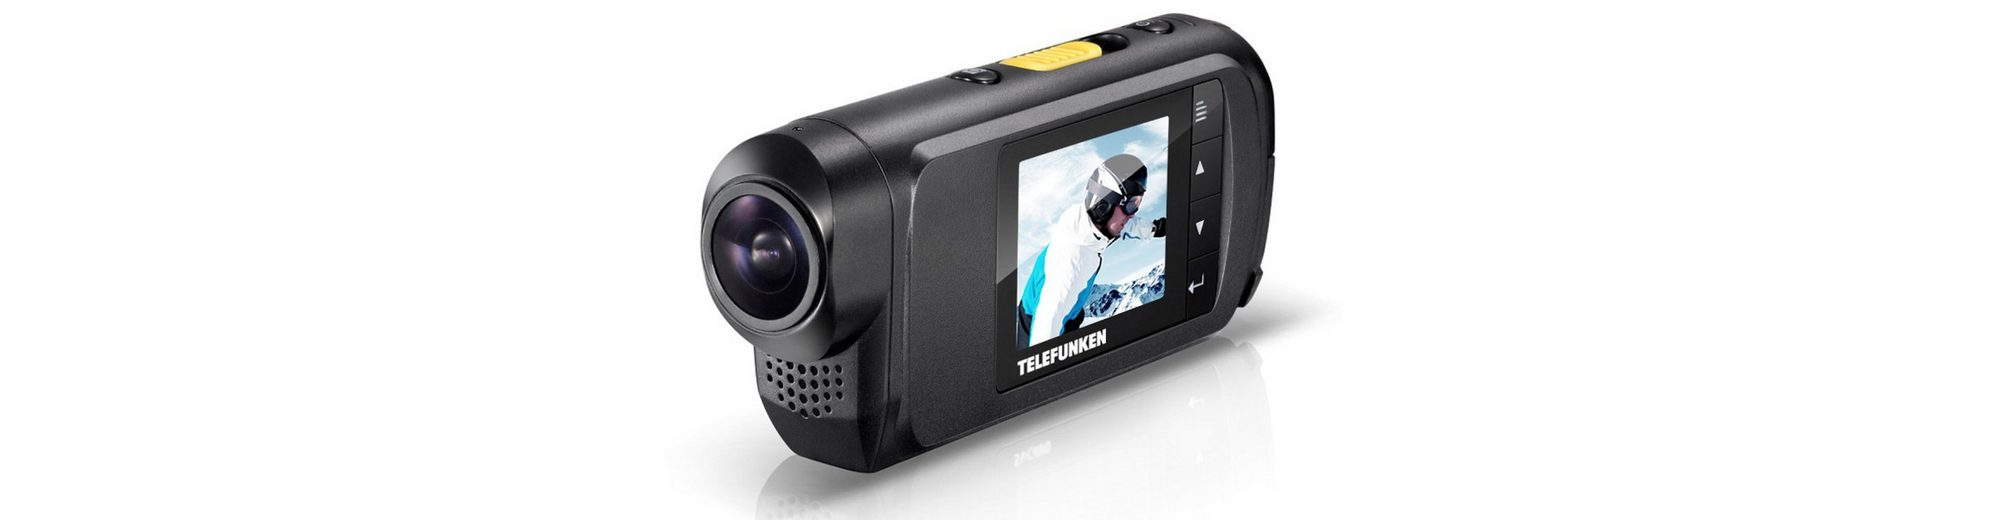 Telefunken Action Cam »FHD170/5 ULTIMATE«